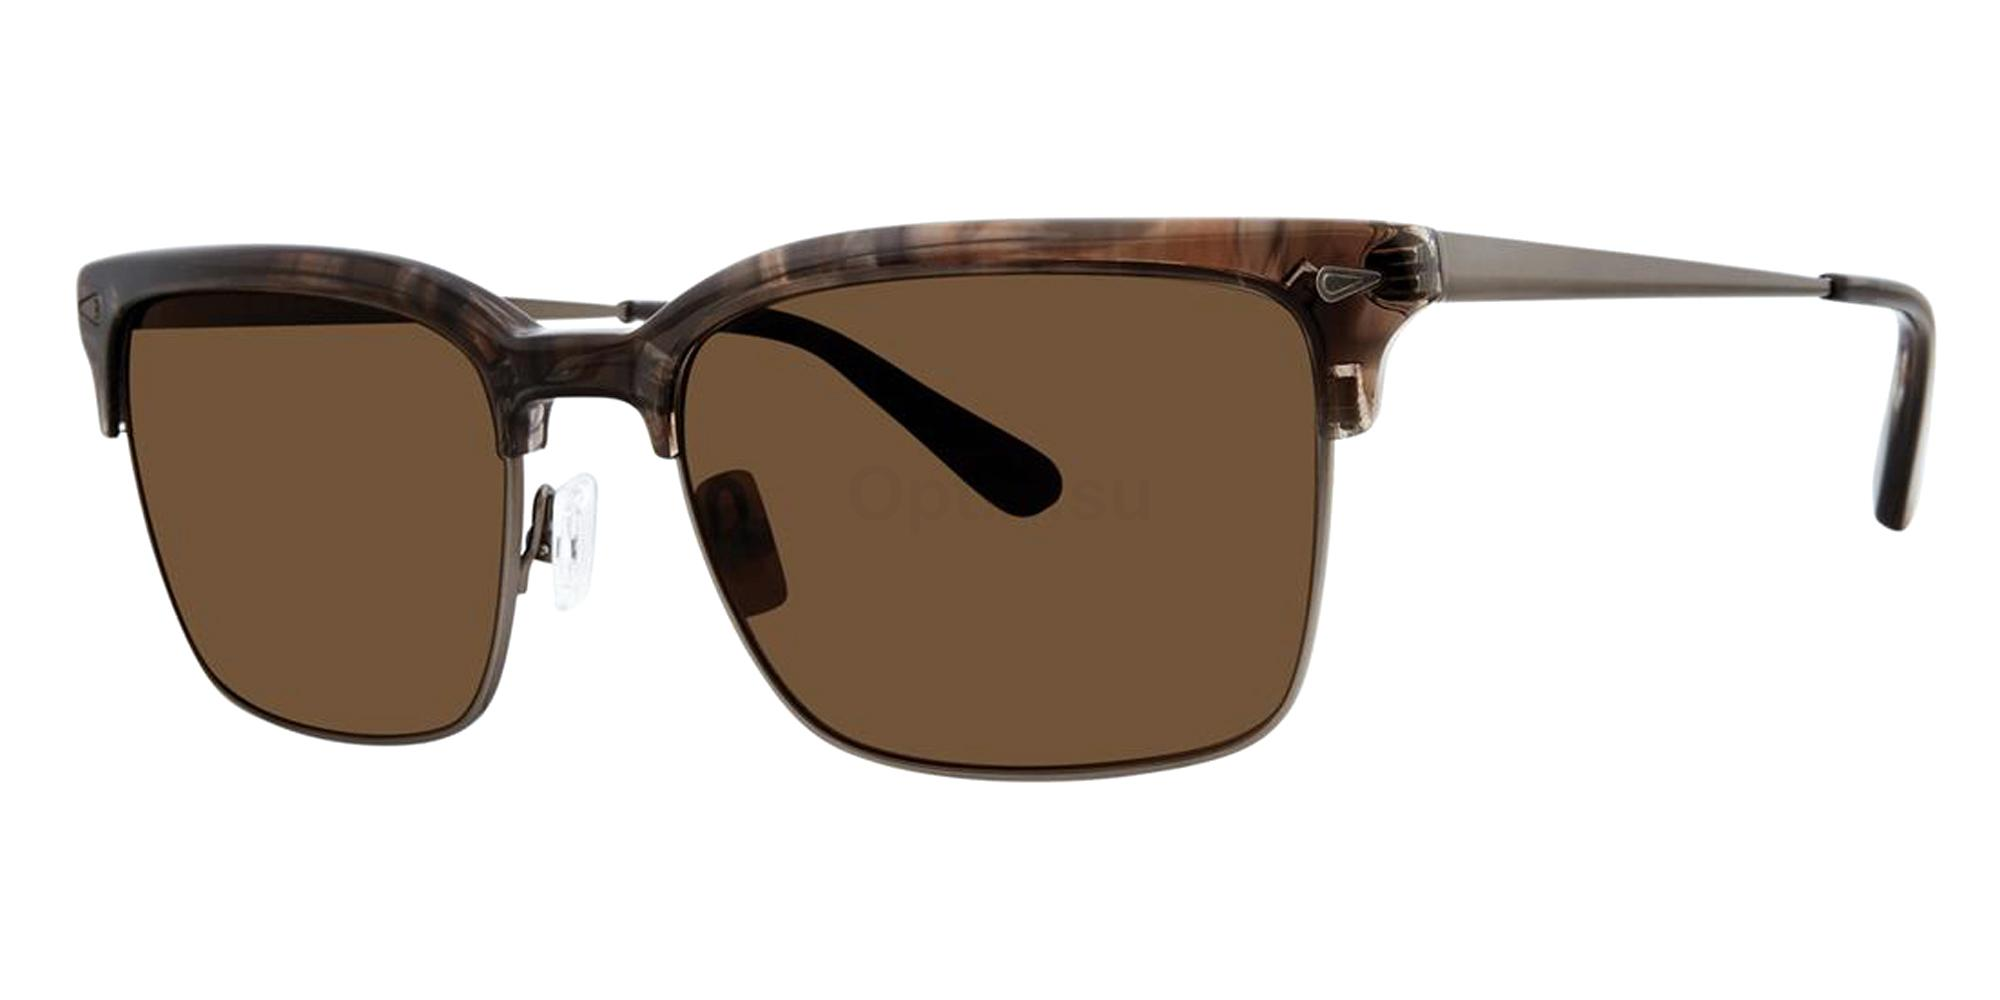 Crystal Walnut DRIGGS Sunglasses, Zac Posen